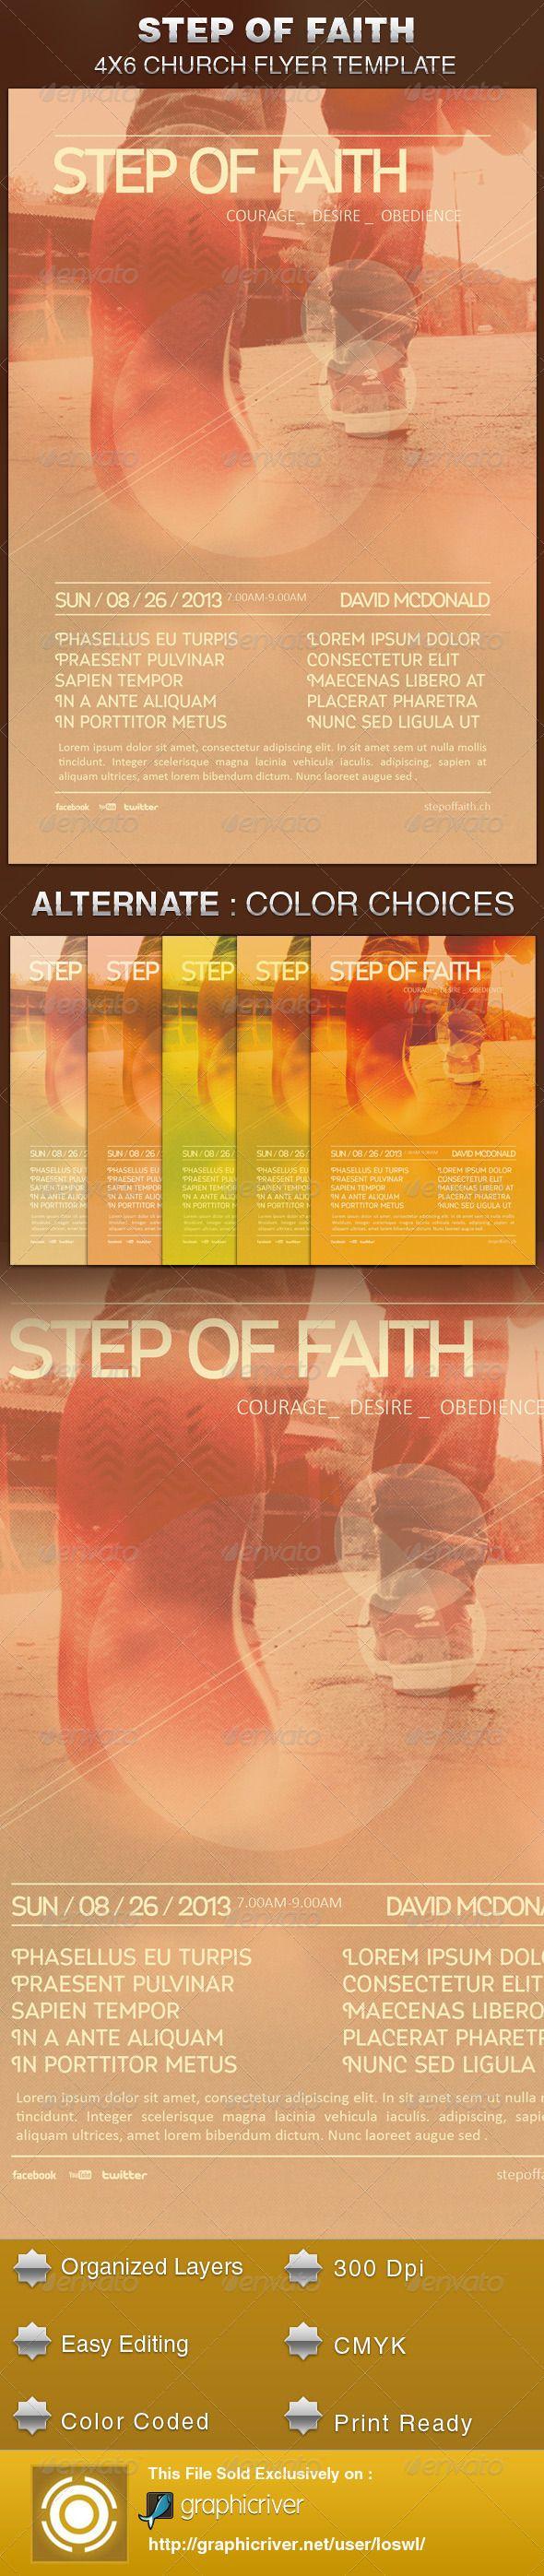 9 best tennis tournament fundraiser images on pinterest step of faith church flyer template fandeluxe Gallery